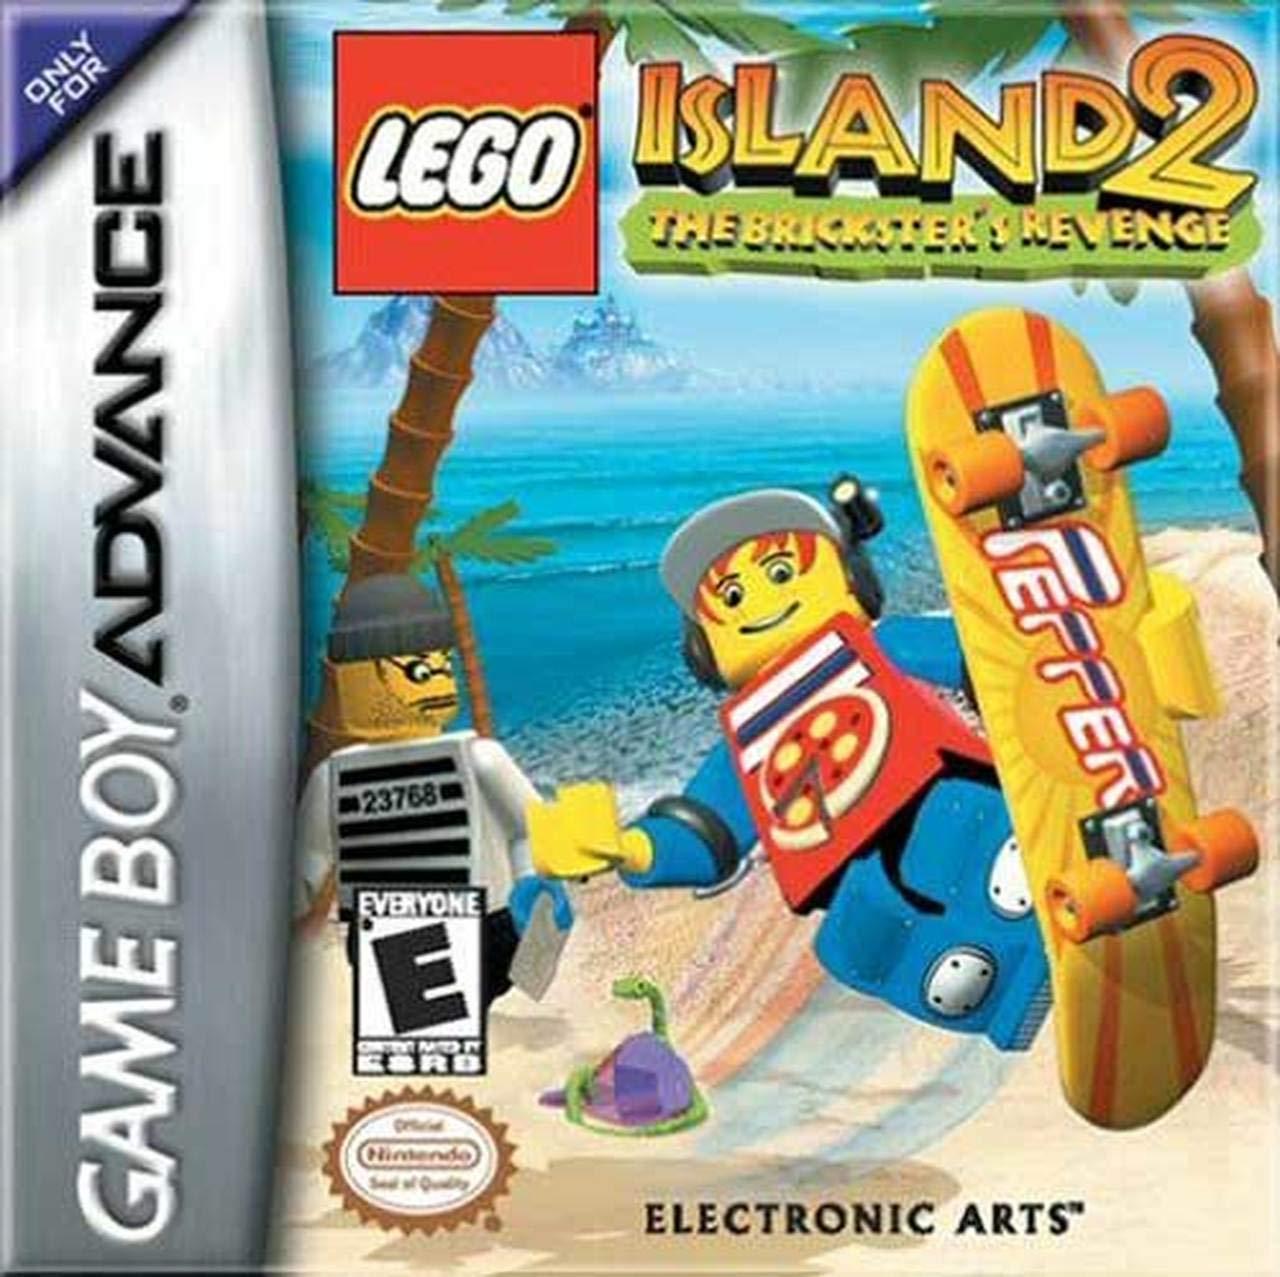 Lego island 2 game boy article gambling online scholarly